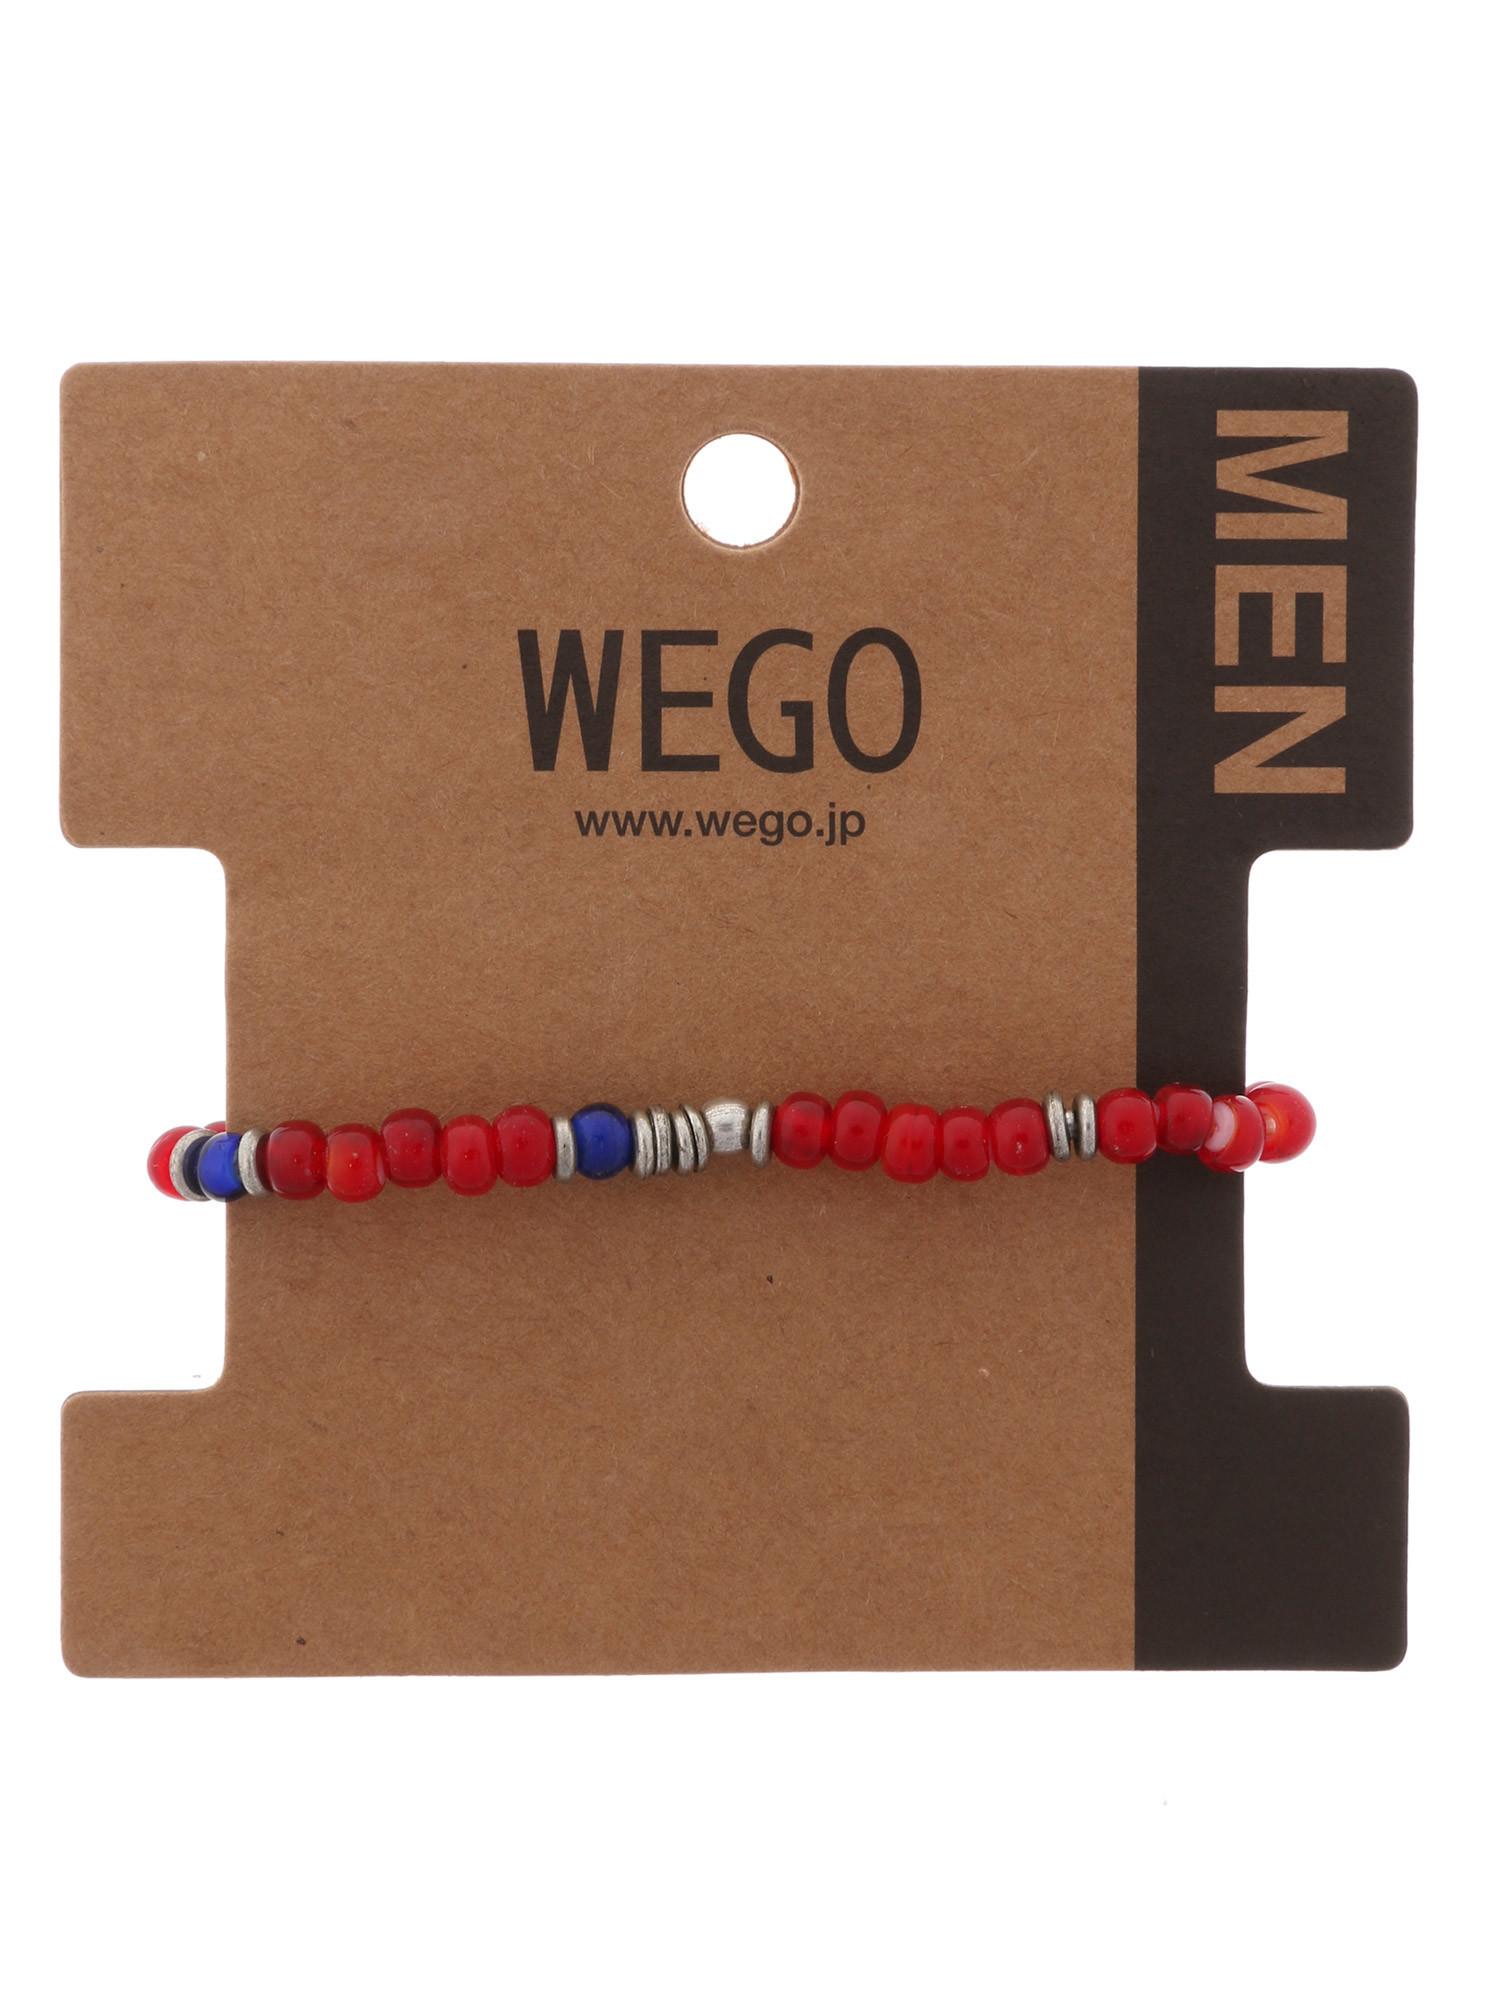 WEGO/ホワイトハーツブレス